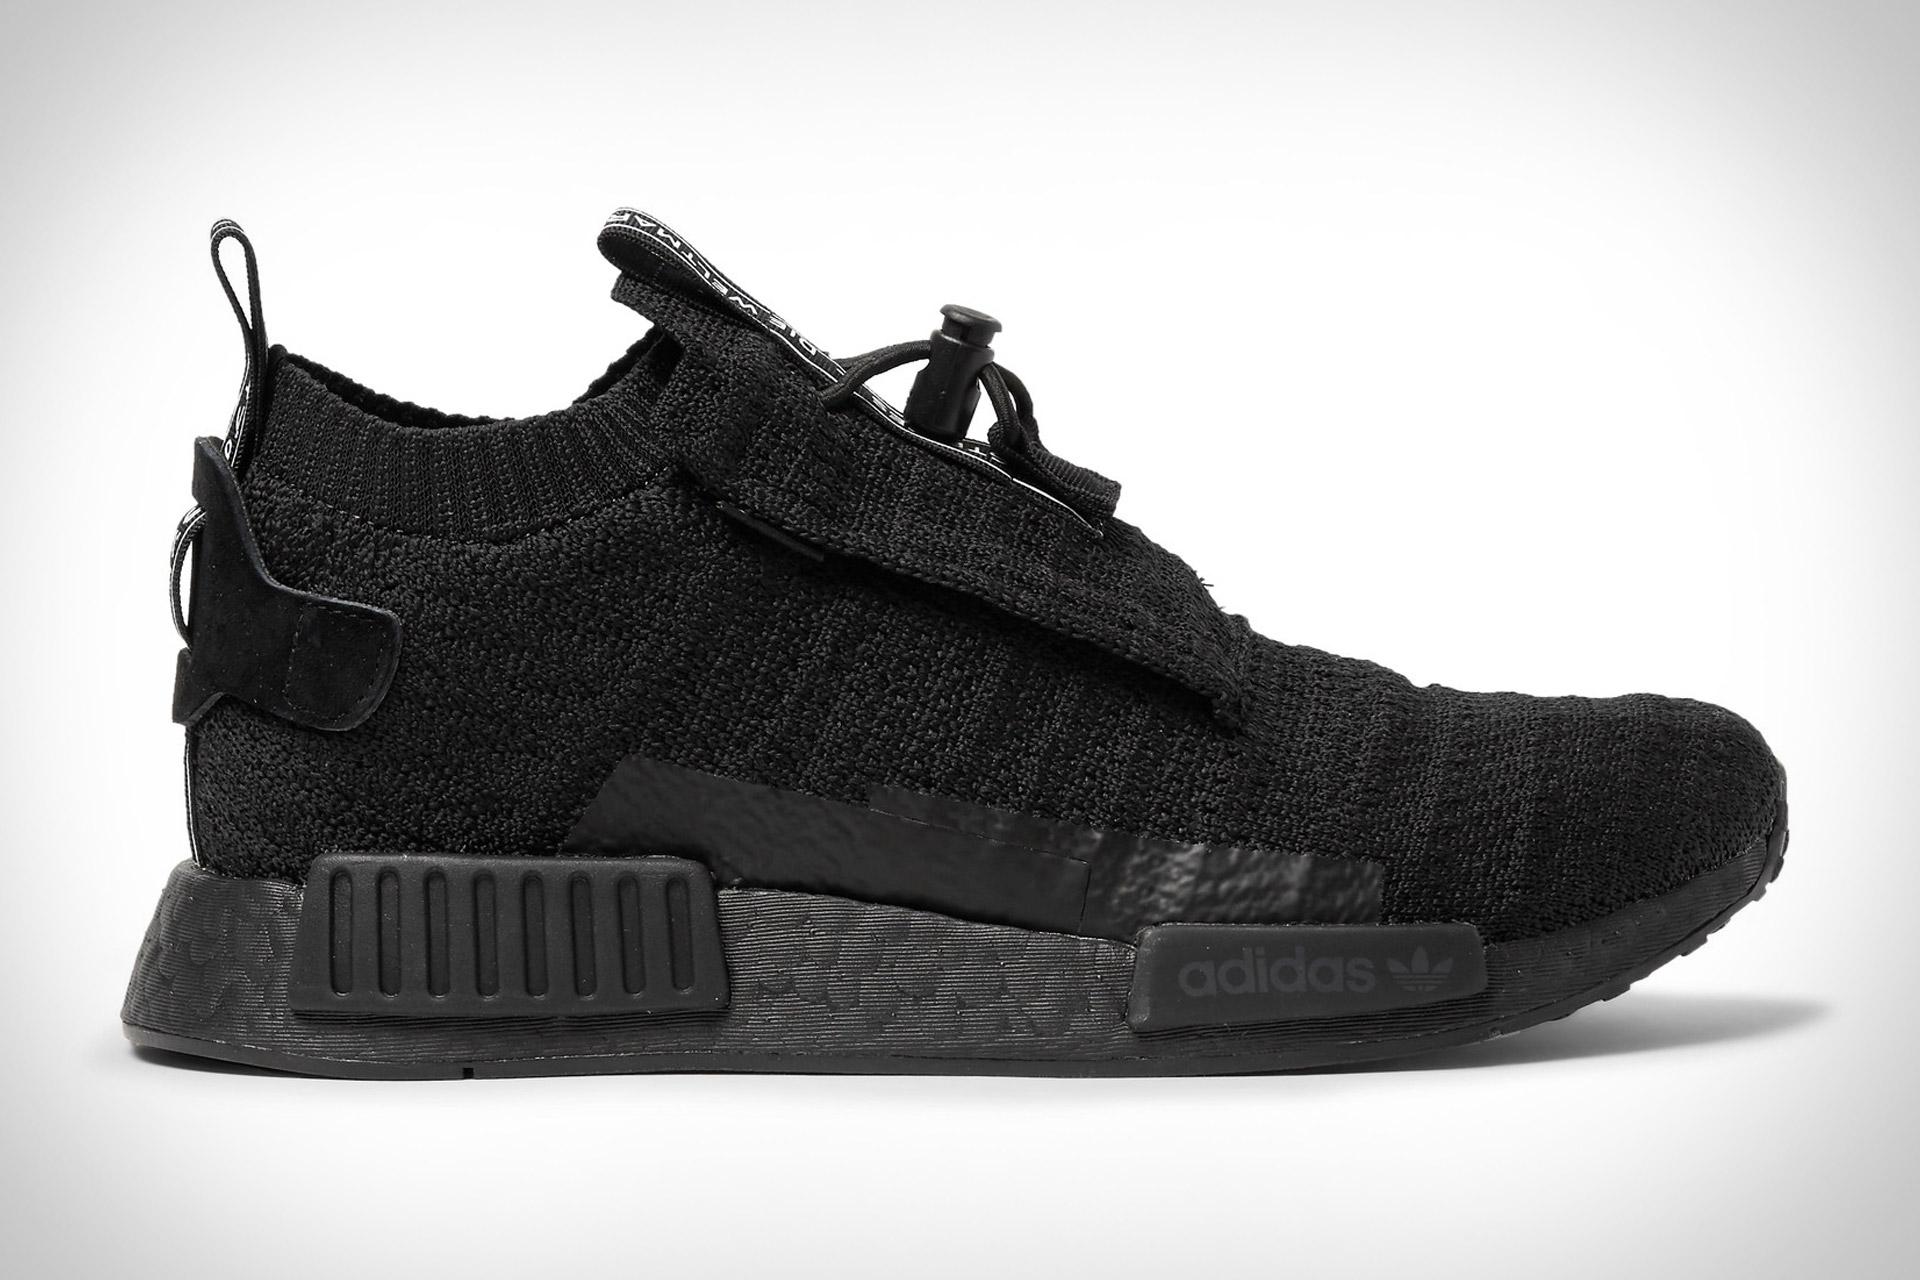 Nmd Adidas Primeknit SneakersUncrate ts1 Originals Gtx n8OP0kwX